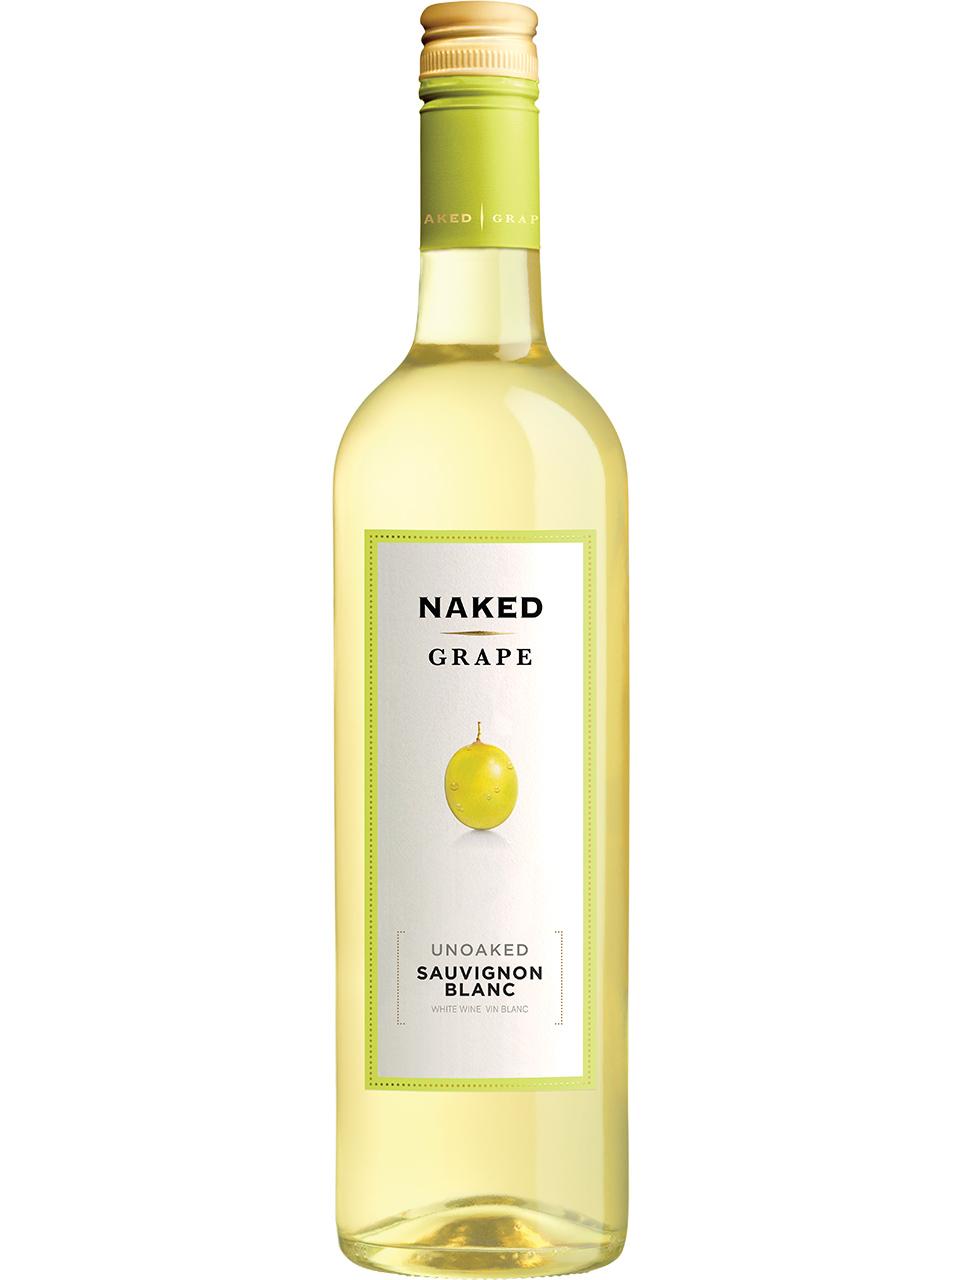 Naked Grape Sauvignon Blanc